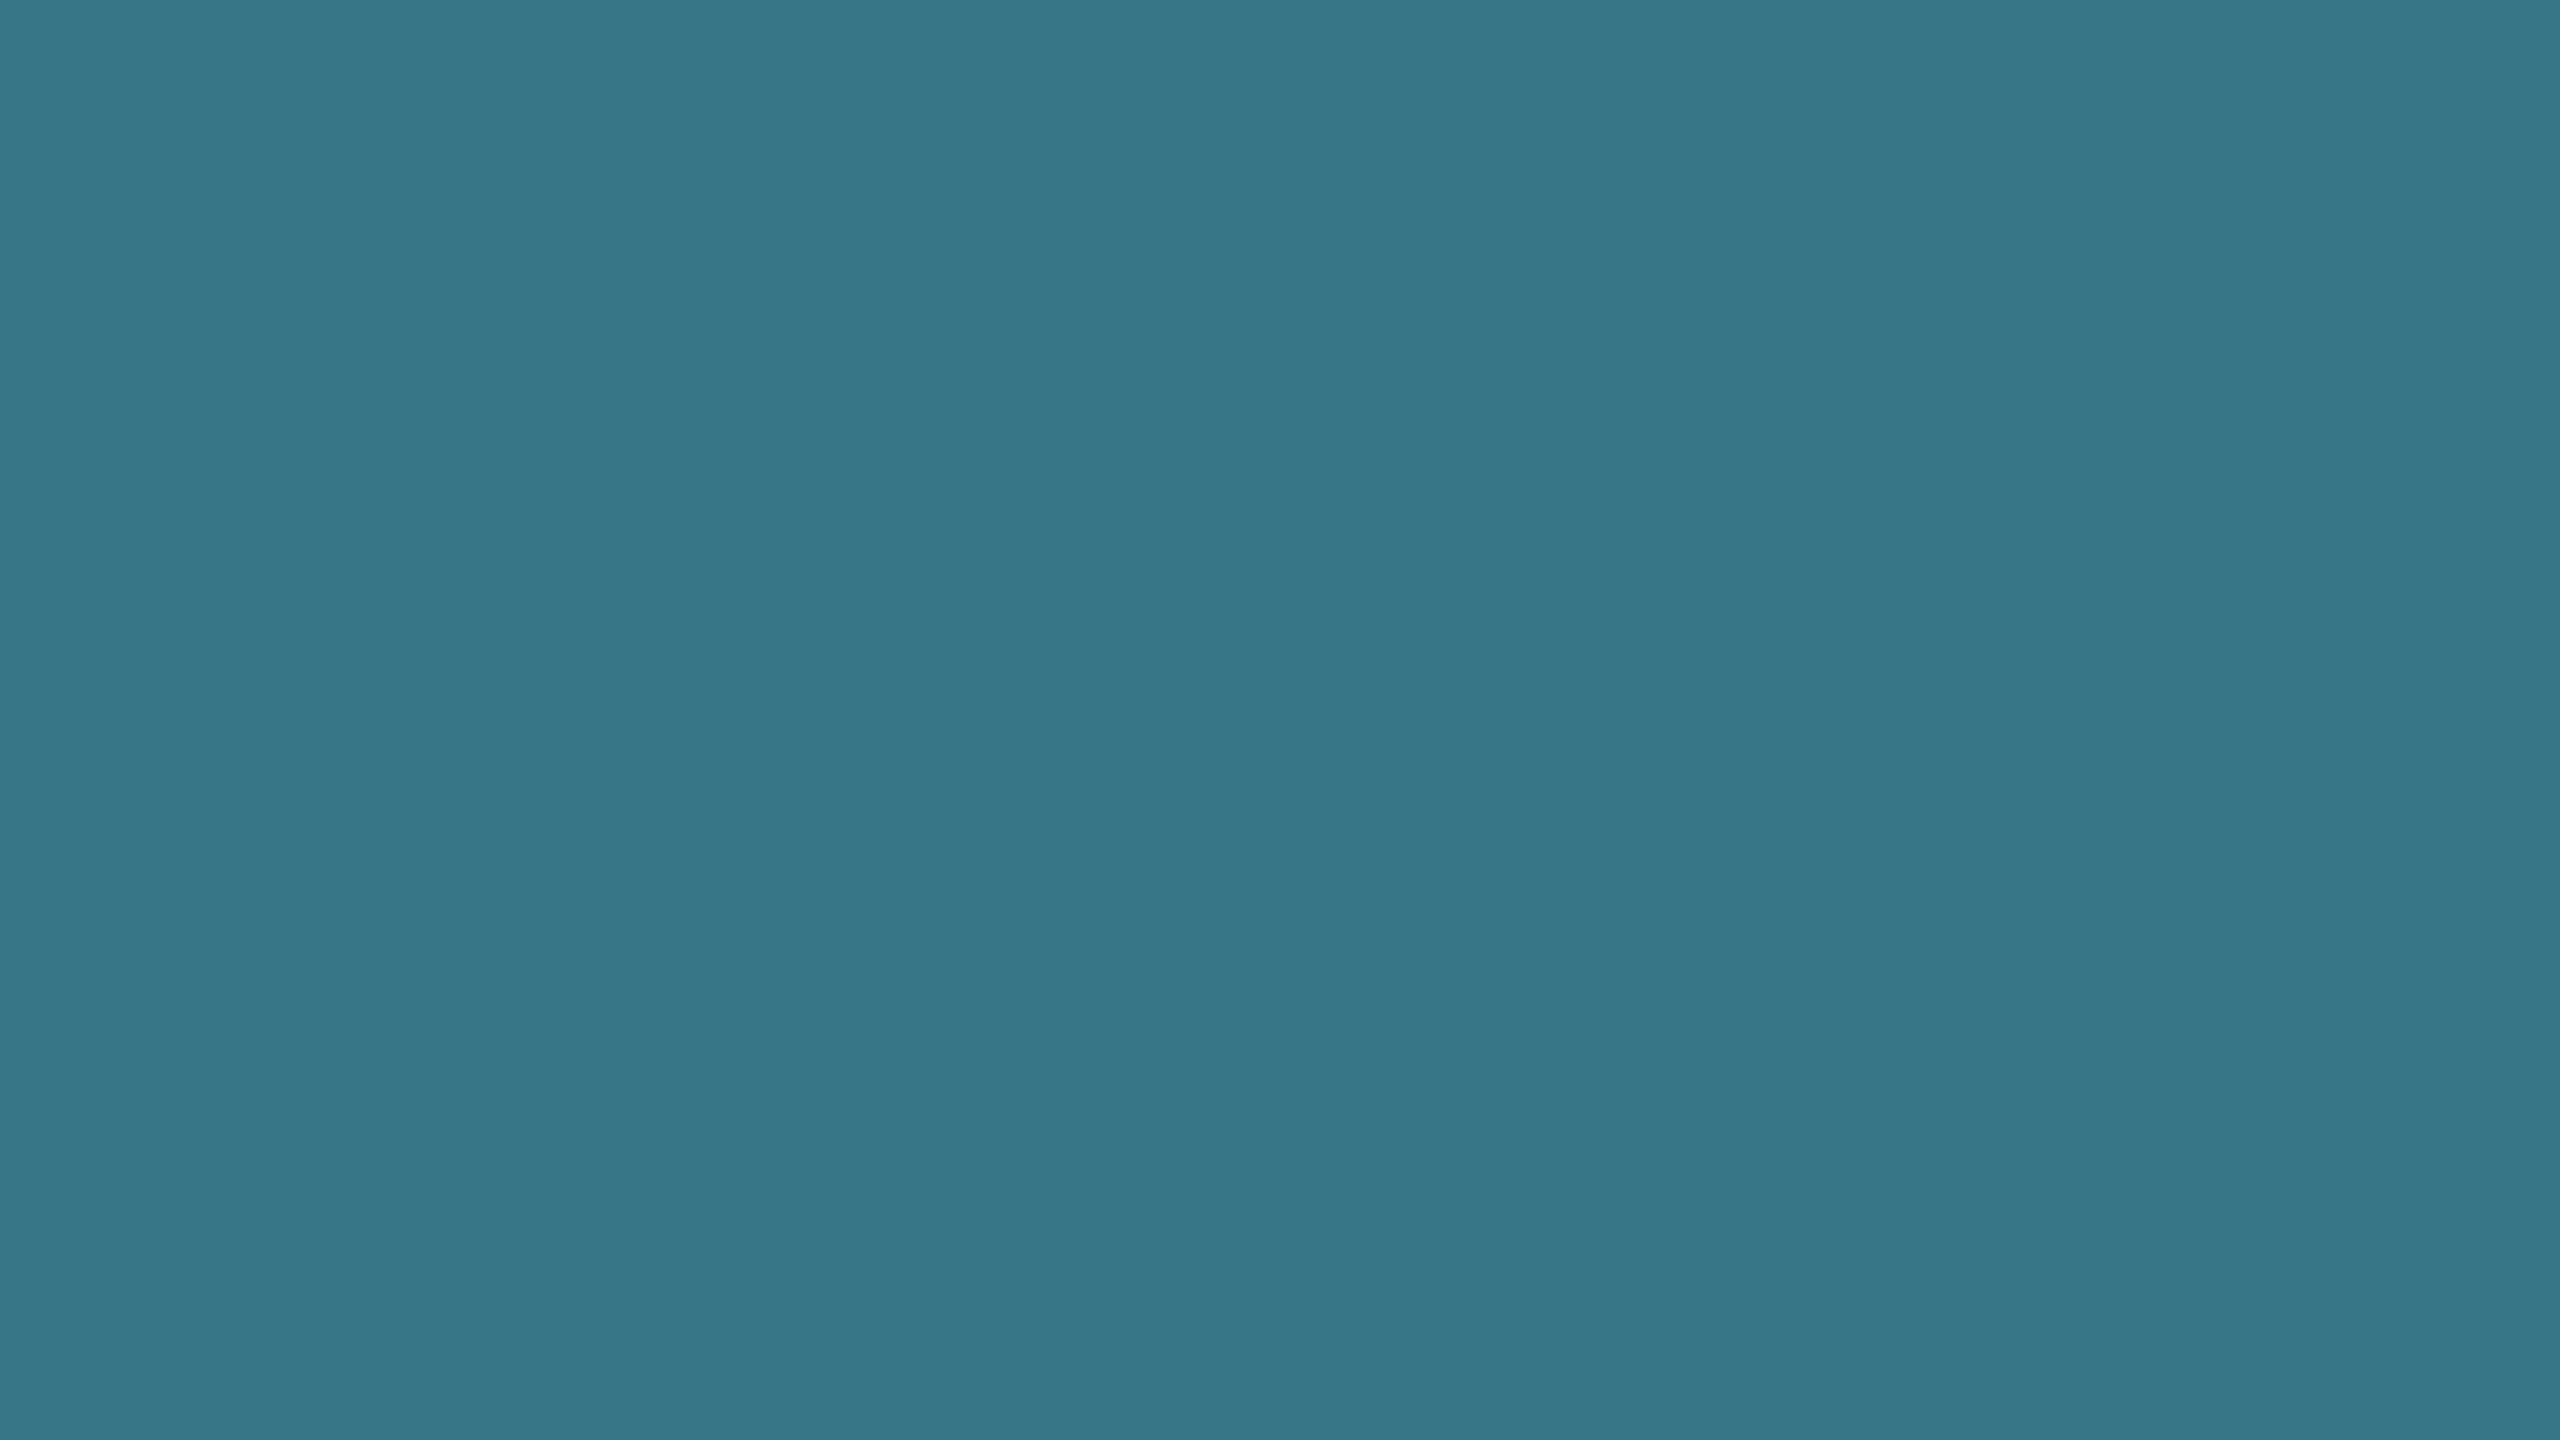 46 Cyan Blue Wallpaper On Wallpapersafari